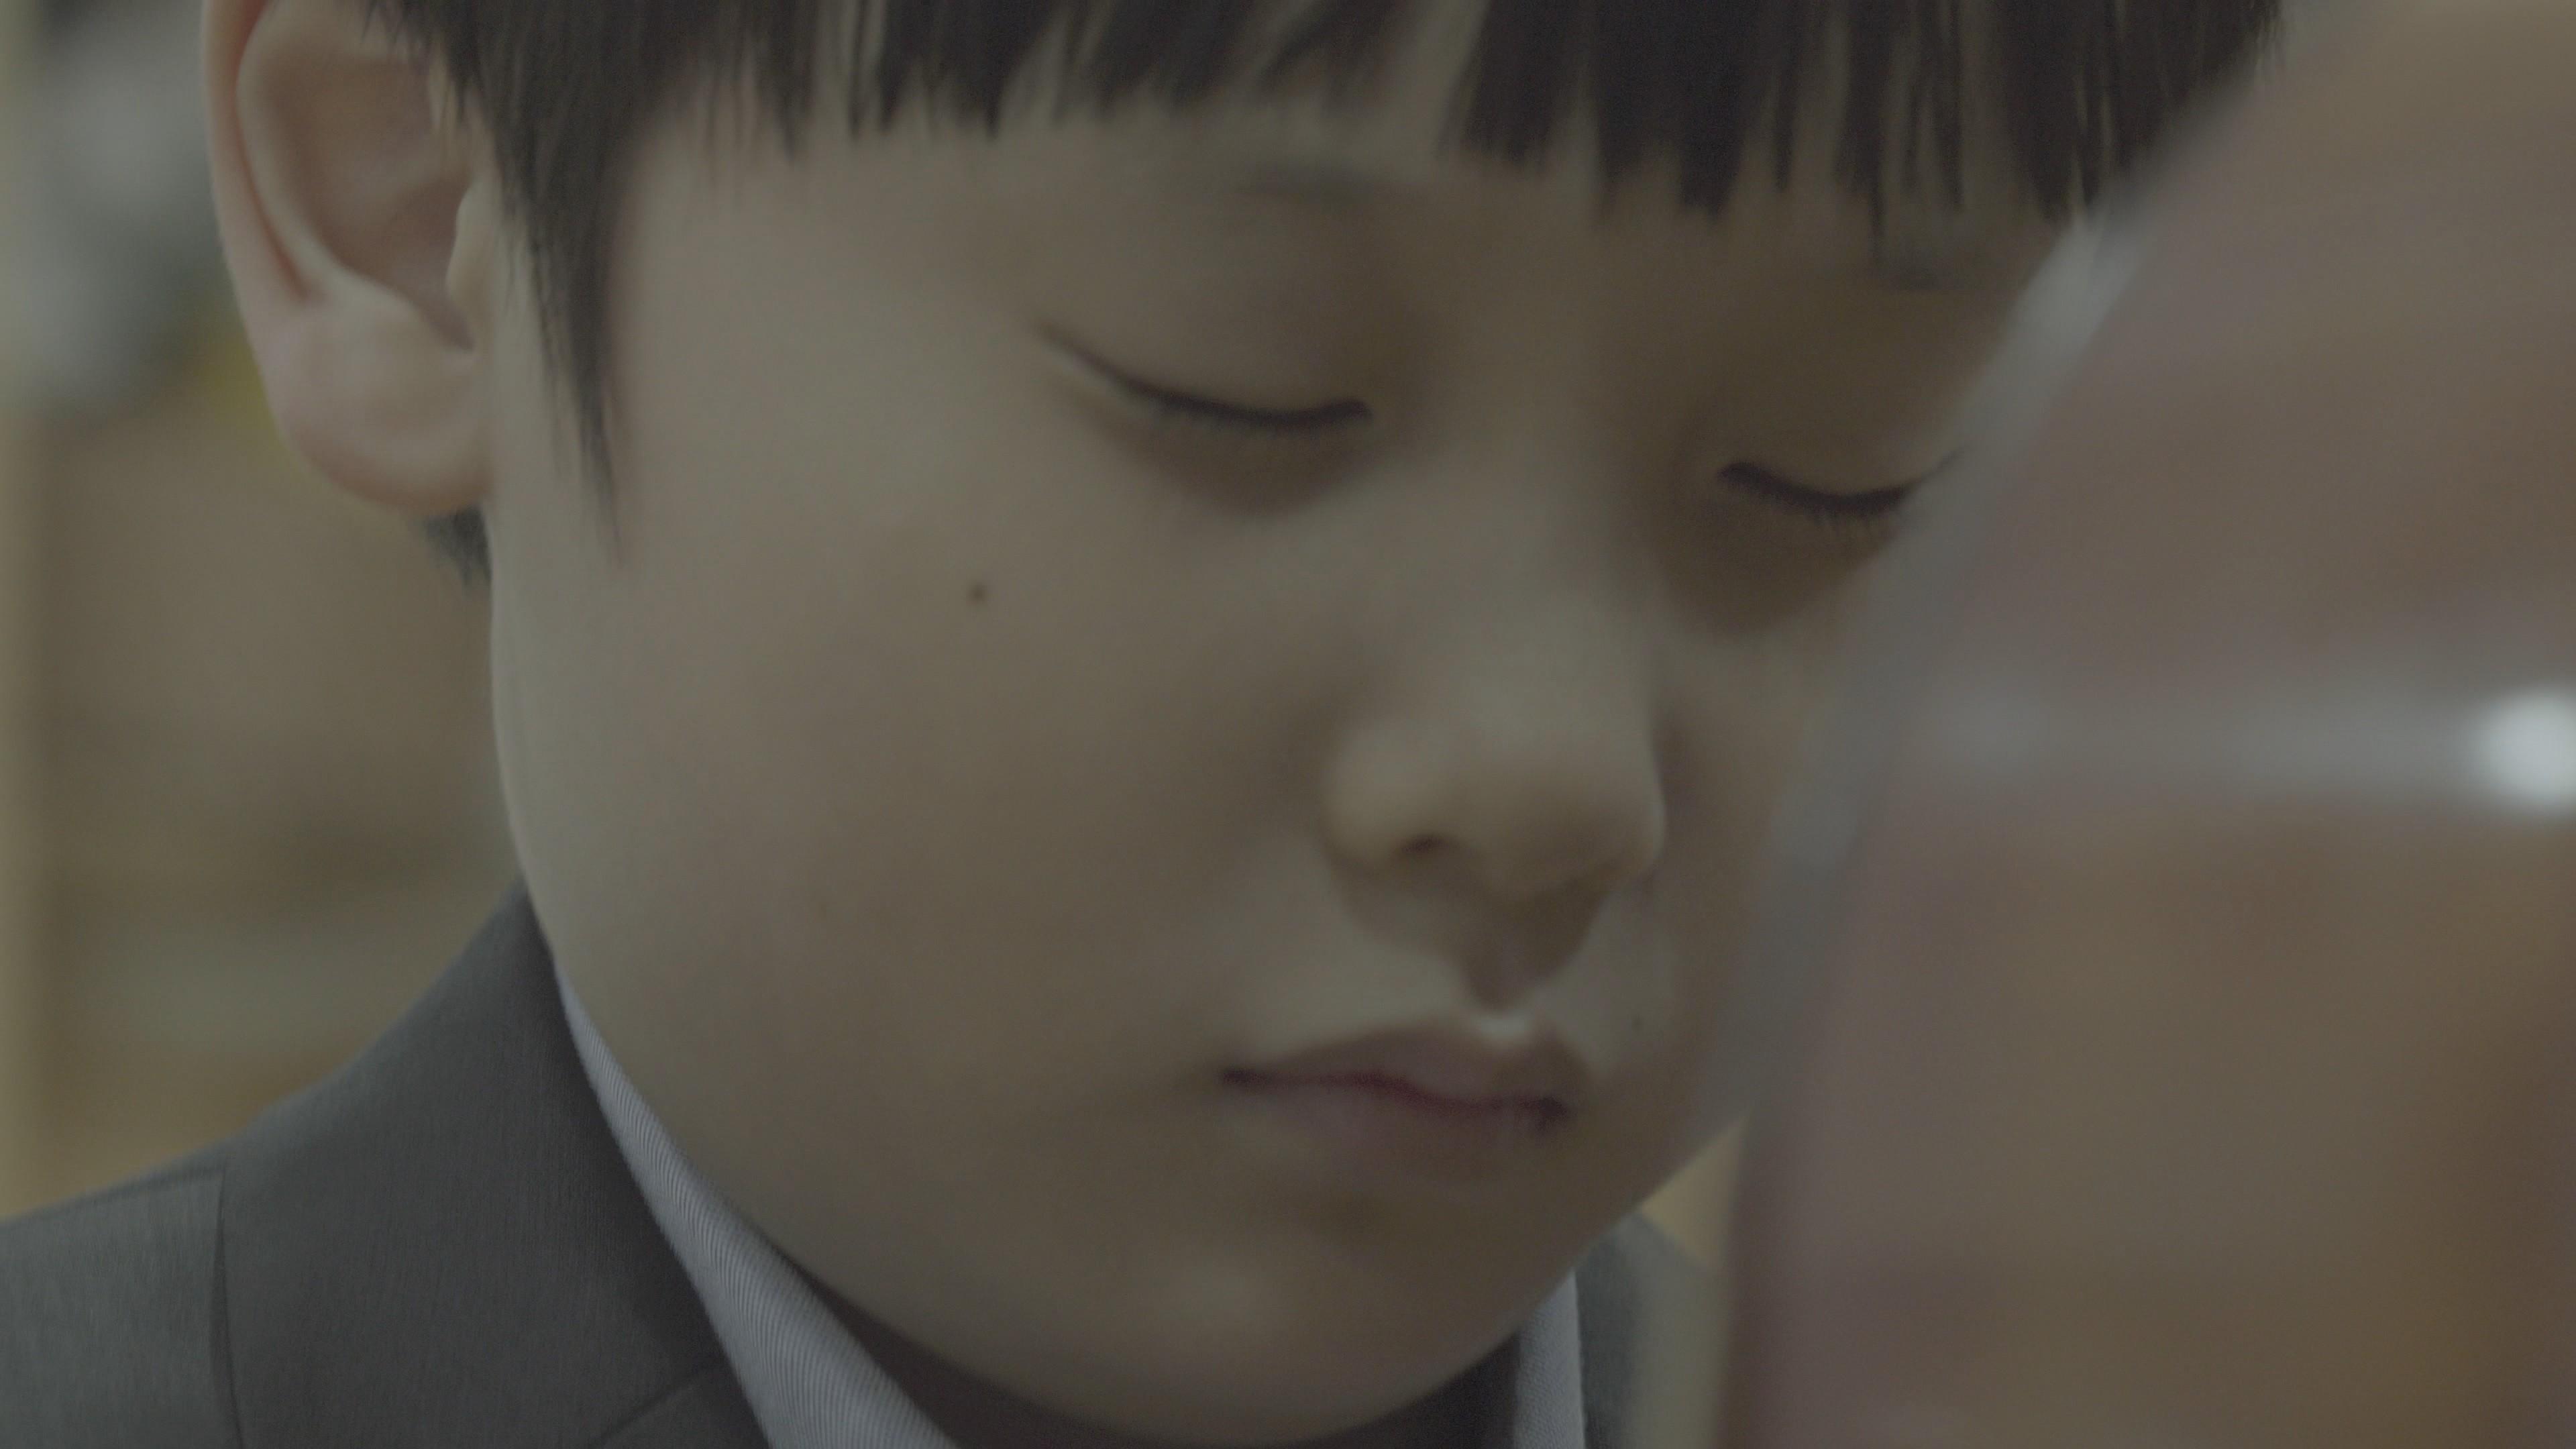 ▲▼紀錄片電影《Beautiful Mind》劇照(圖/翻攝自Naver Post)